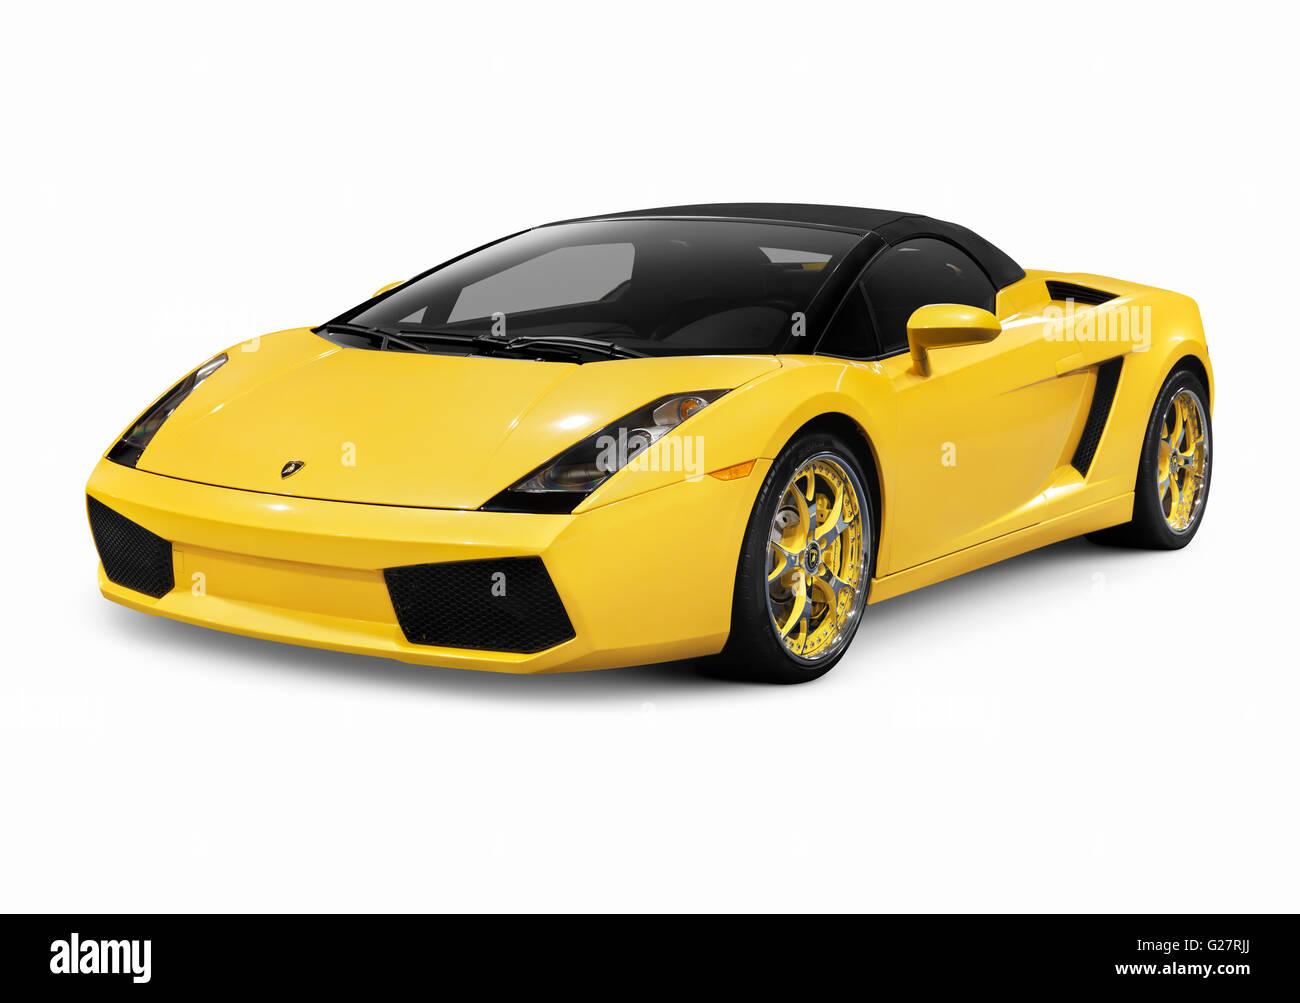 Yellow 2006 Lamborghini Gallardo Spyder, Sports Car   Stock Image